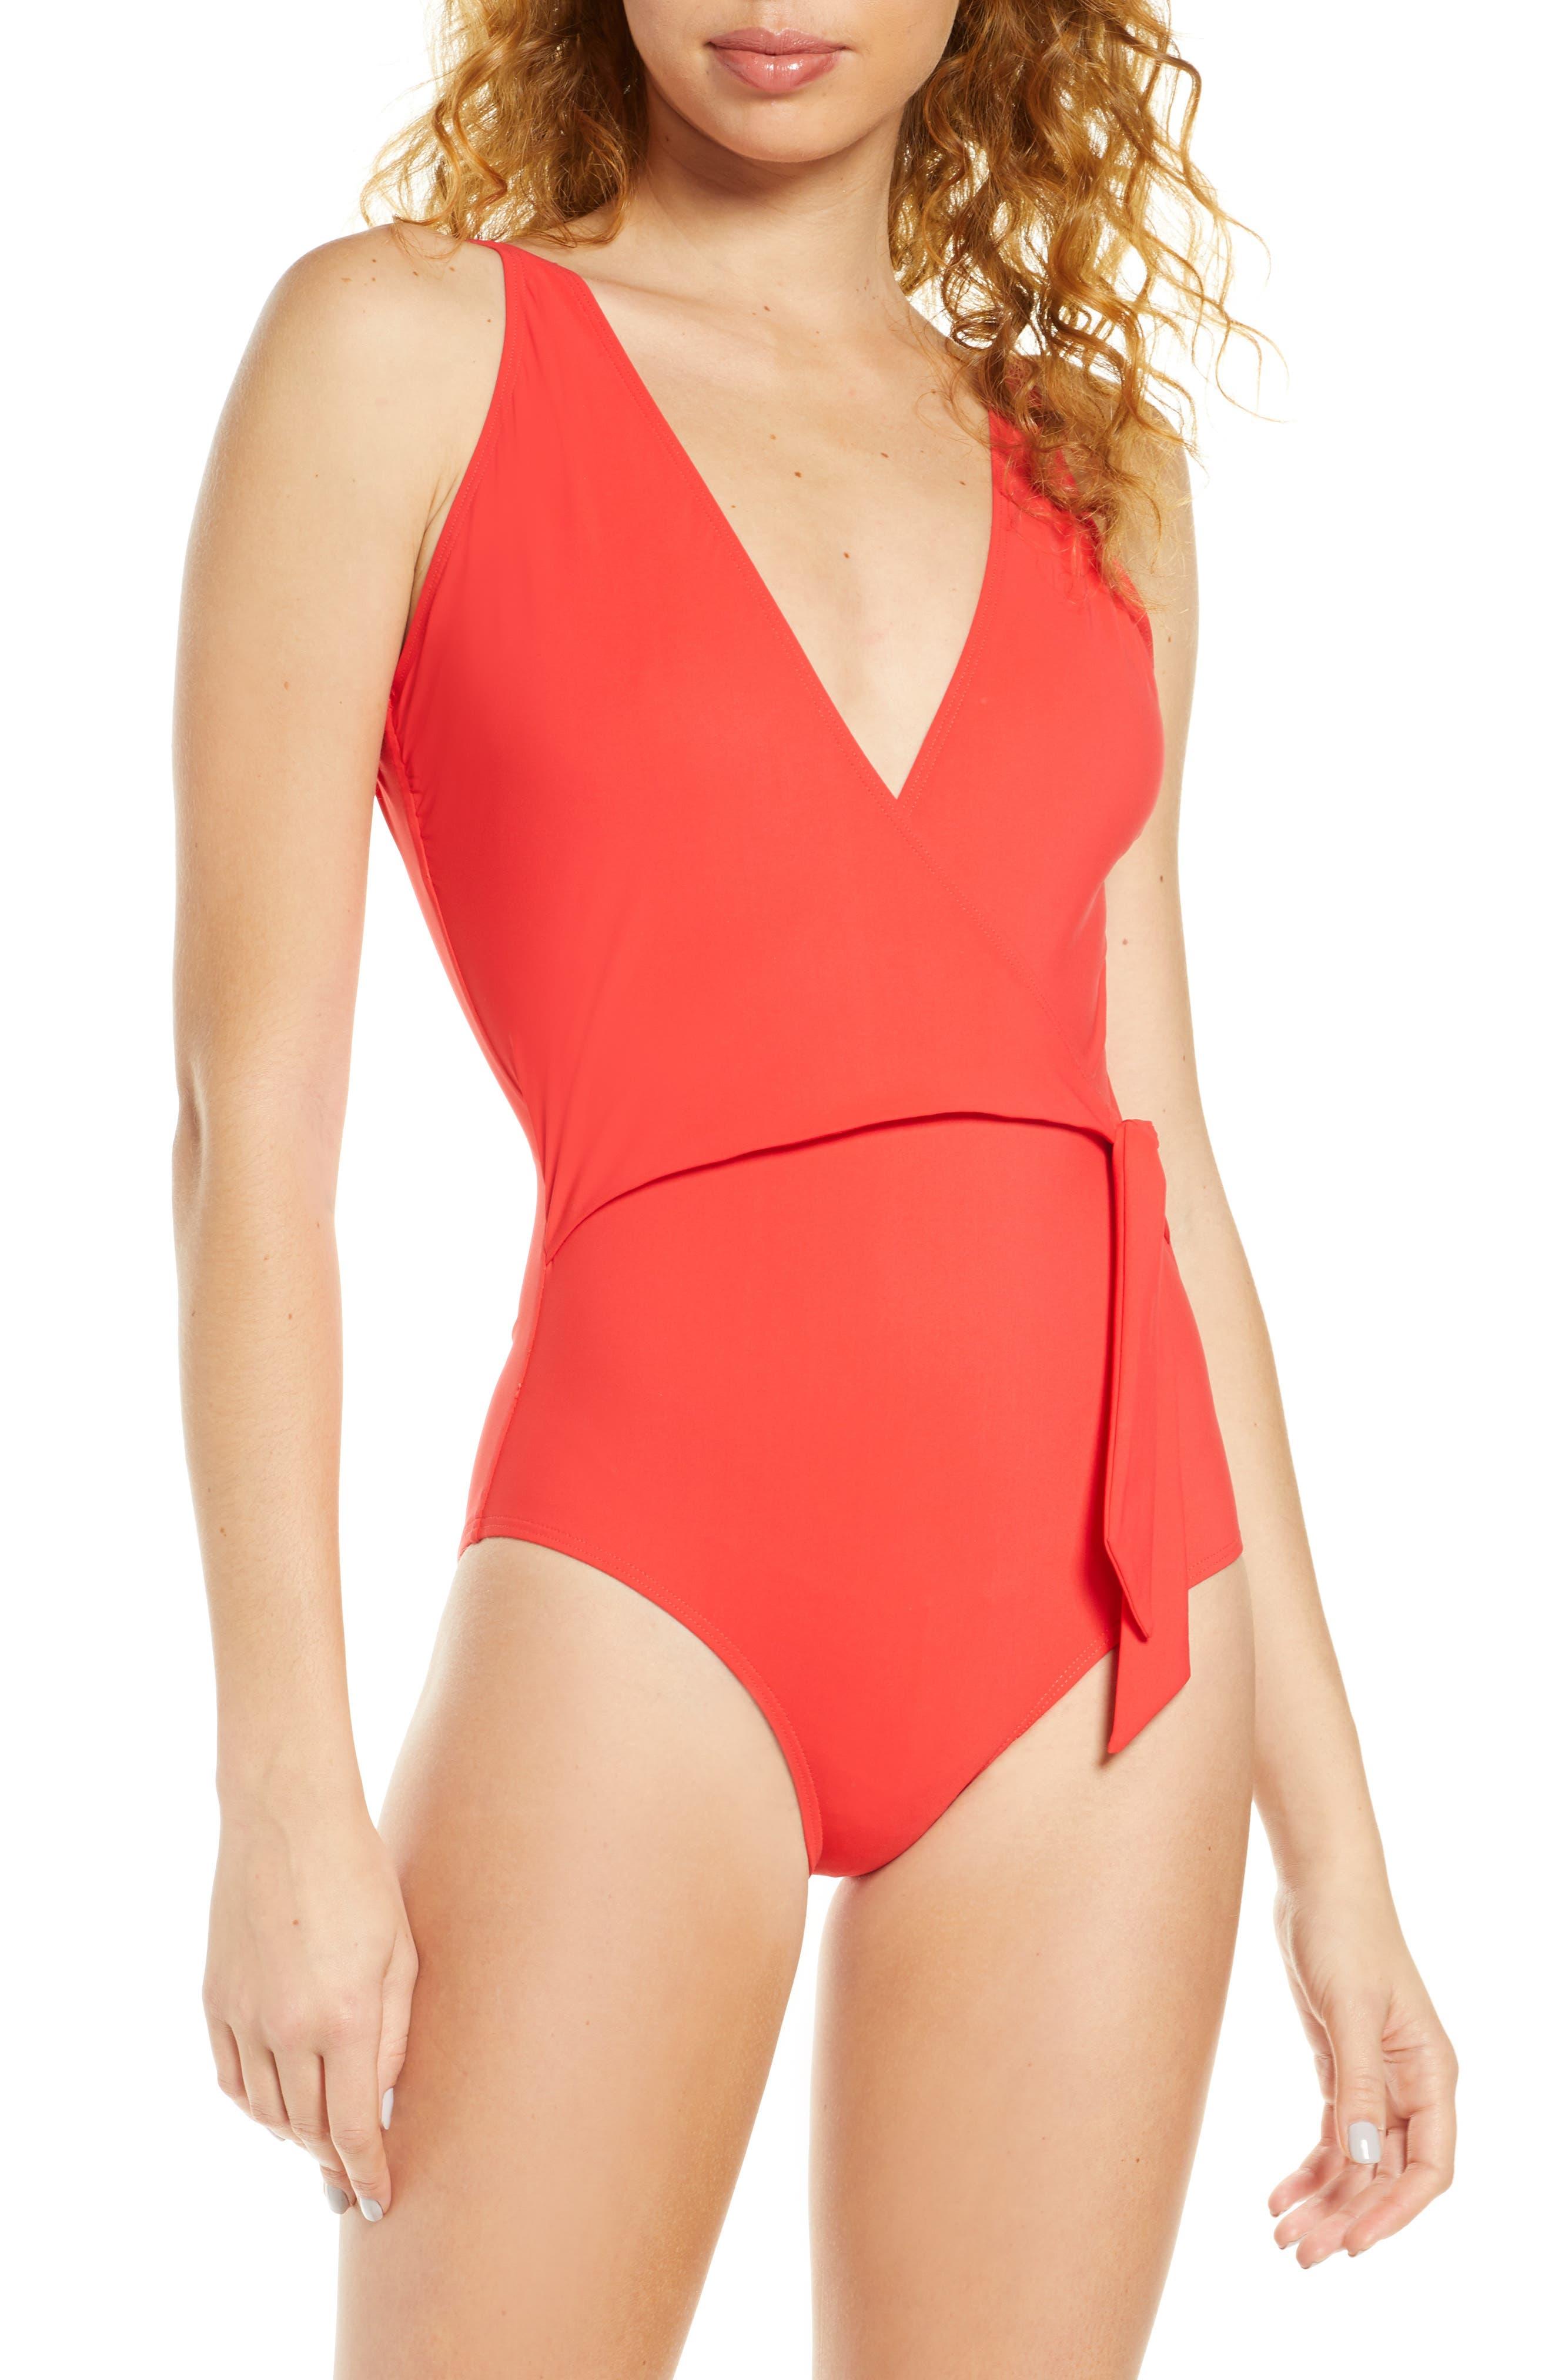 Tory Burch Side Tie One-Piece Swimsuit